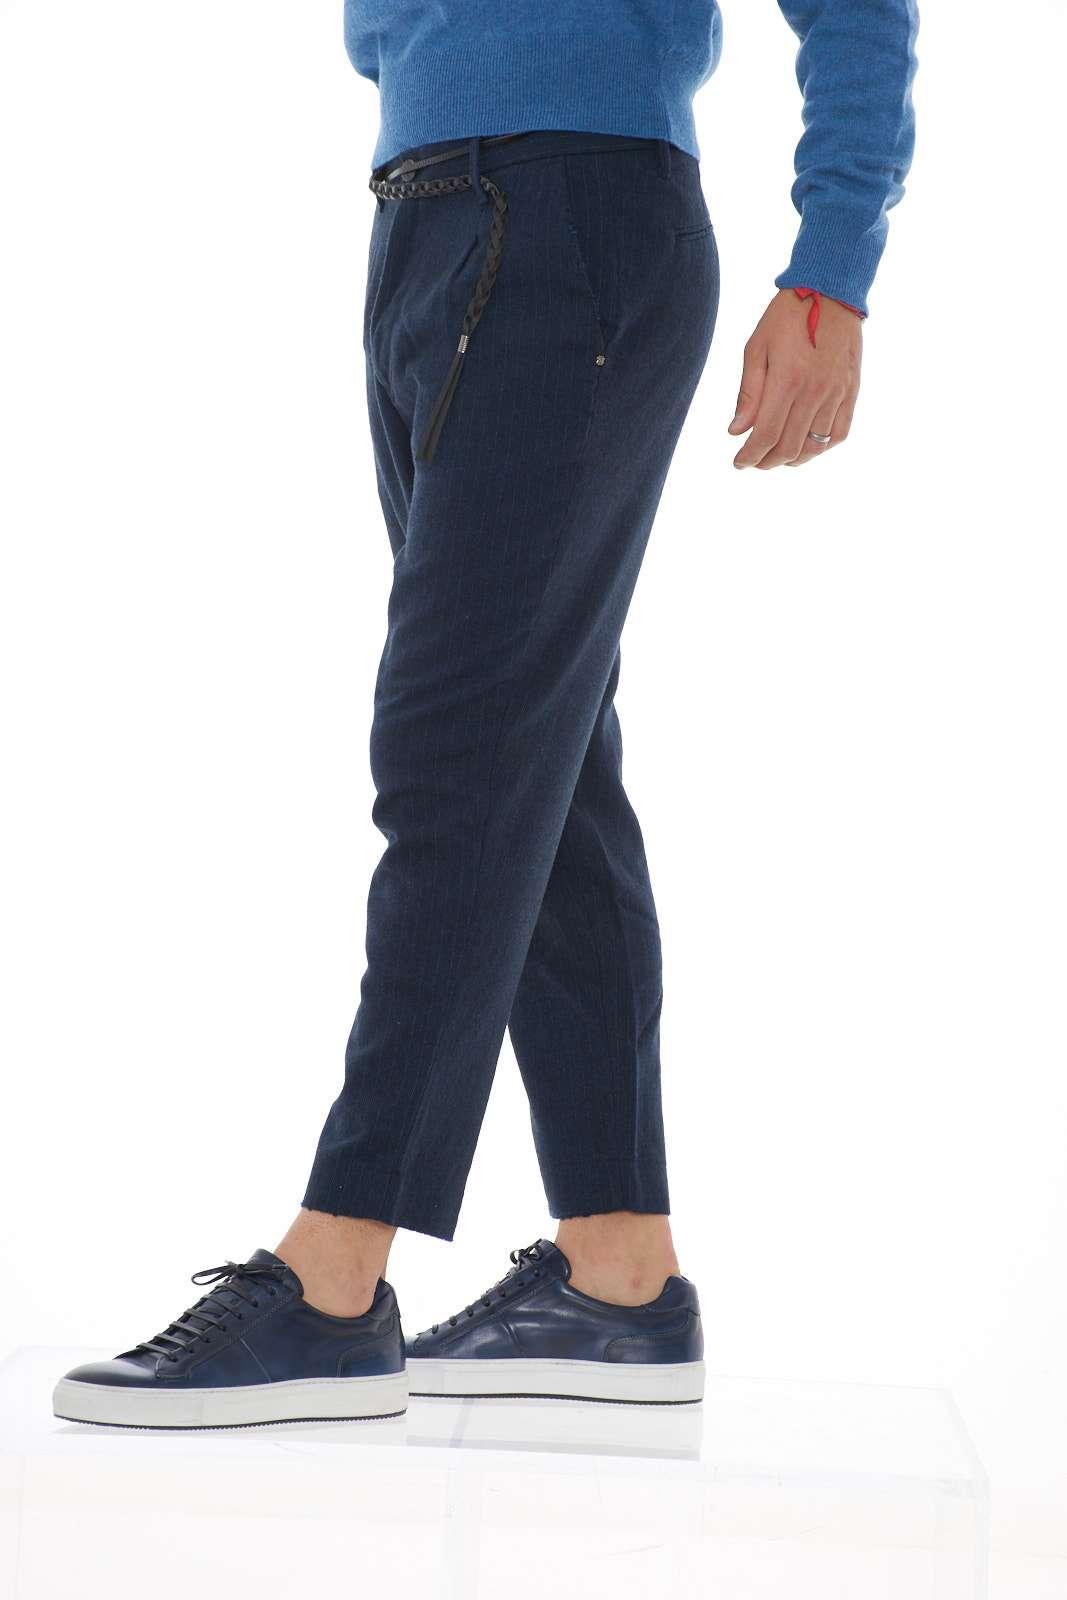 https://www.parmax.com/media/catalog/product/A/I/AI-outlet_parmax-pantaloni-uomo-Squad-qlc9744-B.jpg